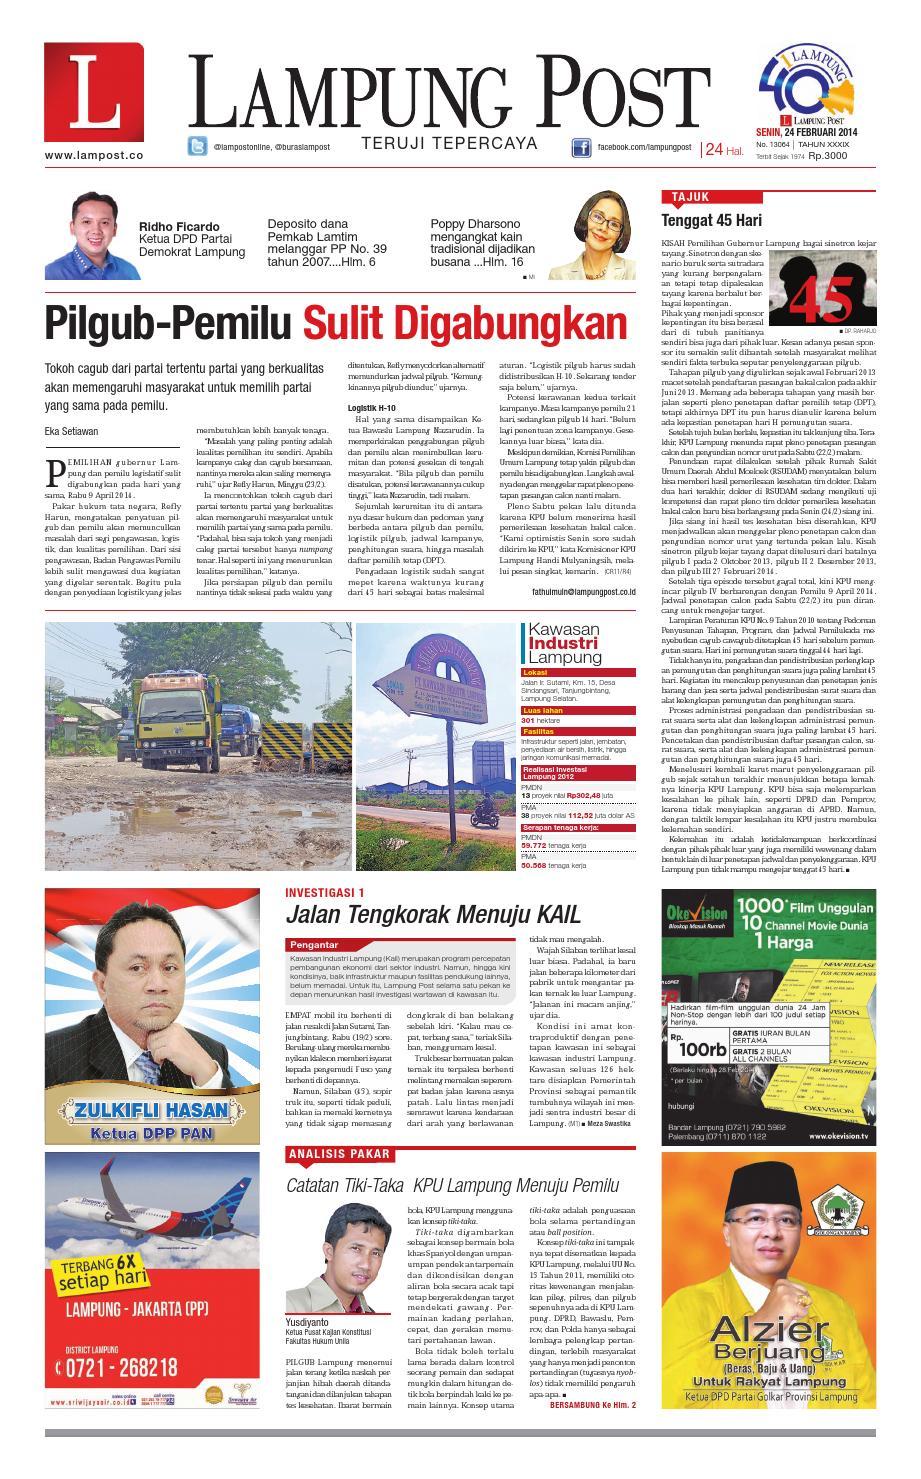 Lampung Post Senin 24 Februari 2014 By Lampung Post Issuu # Muebles Koyga Vigo